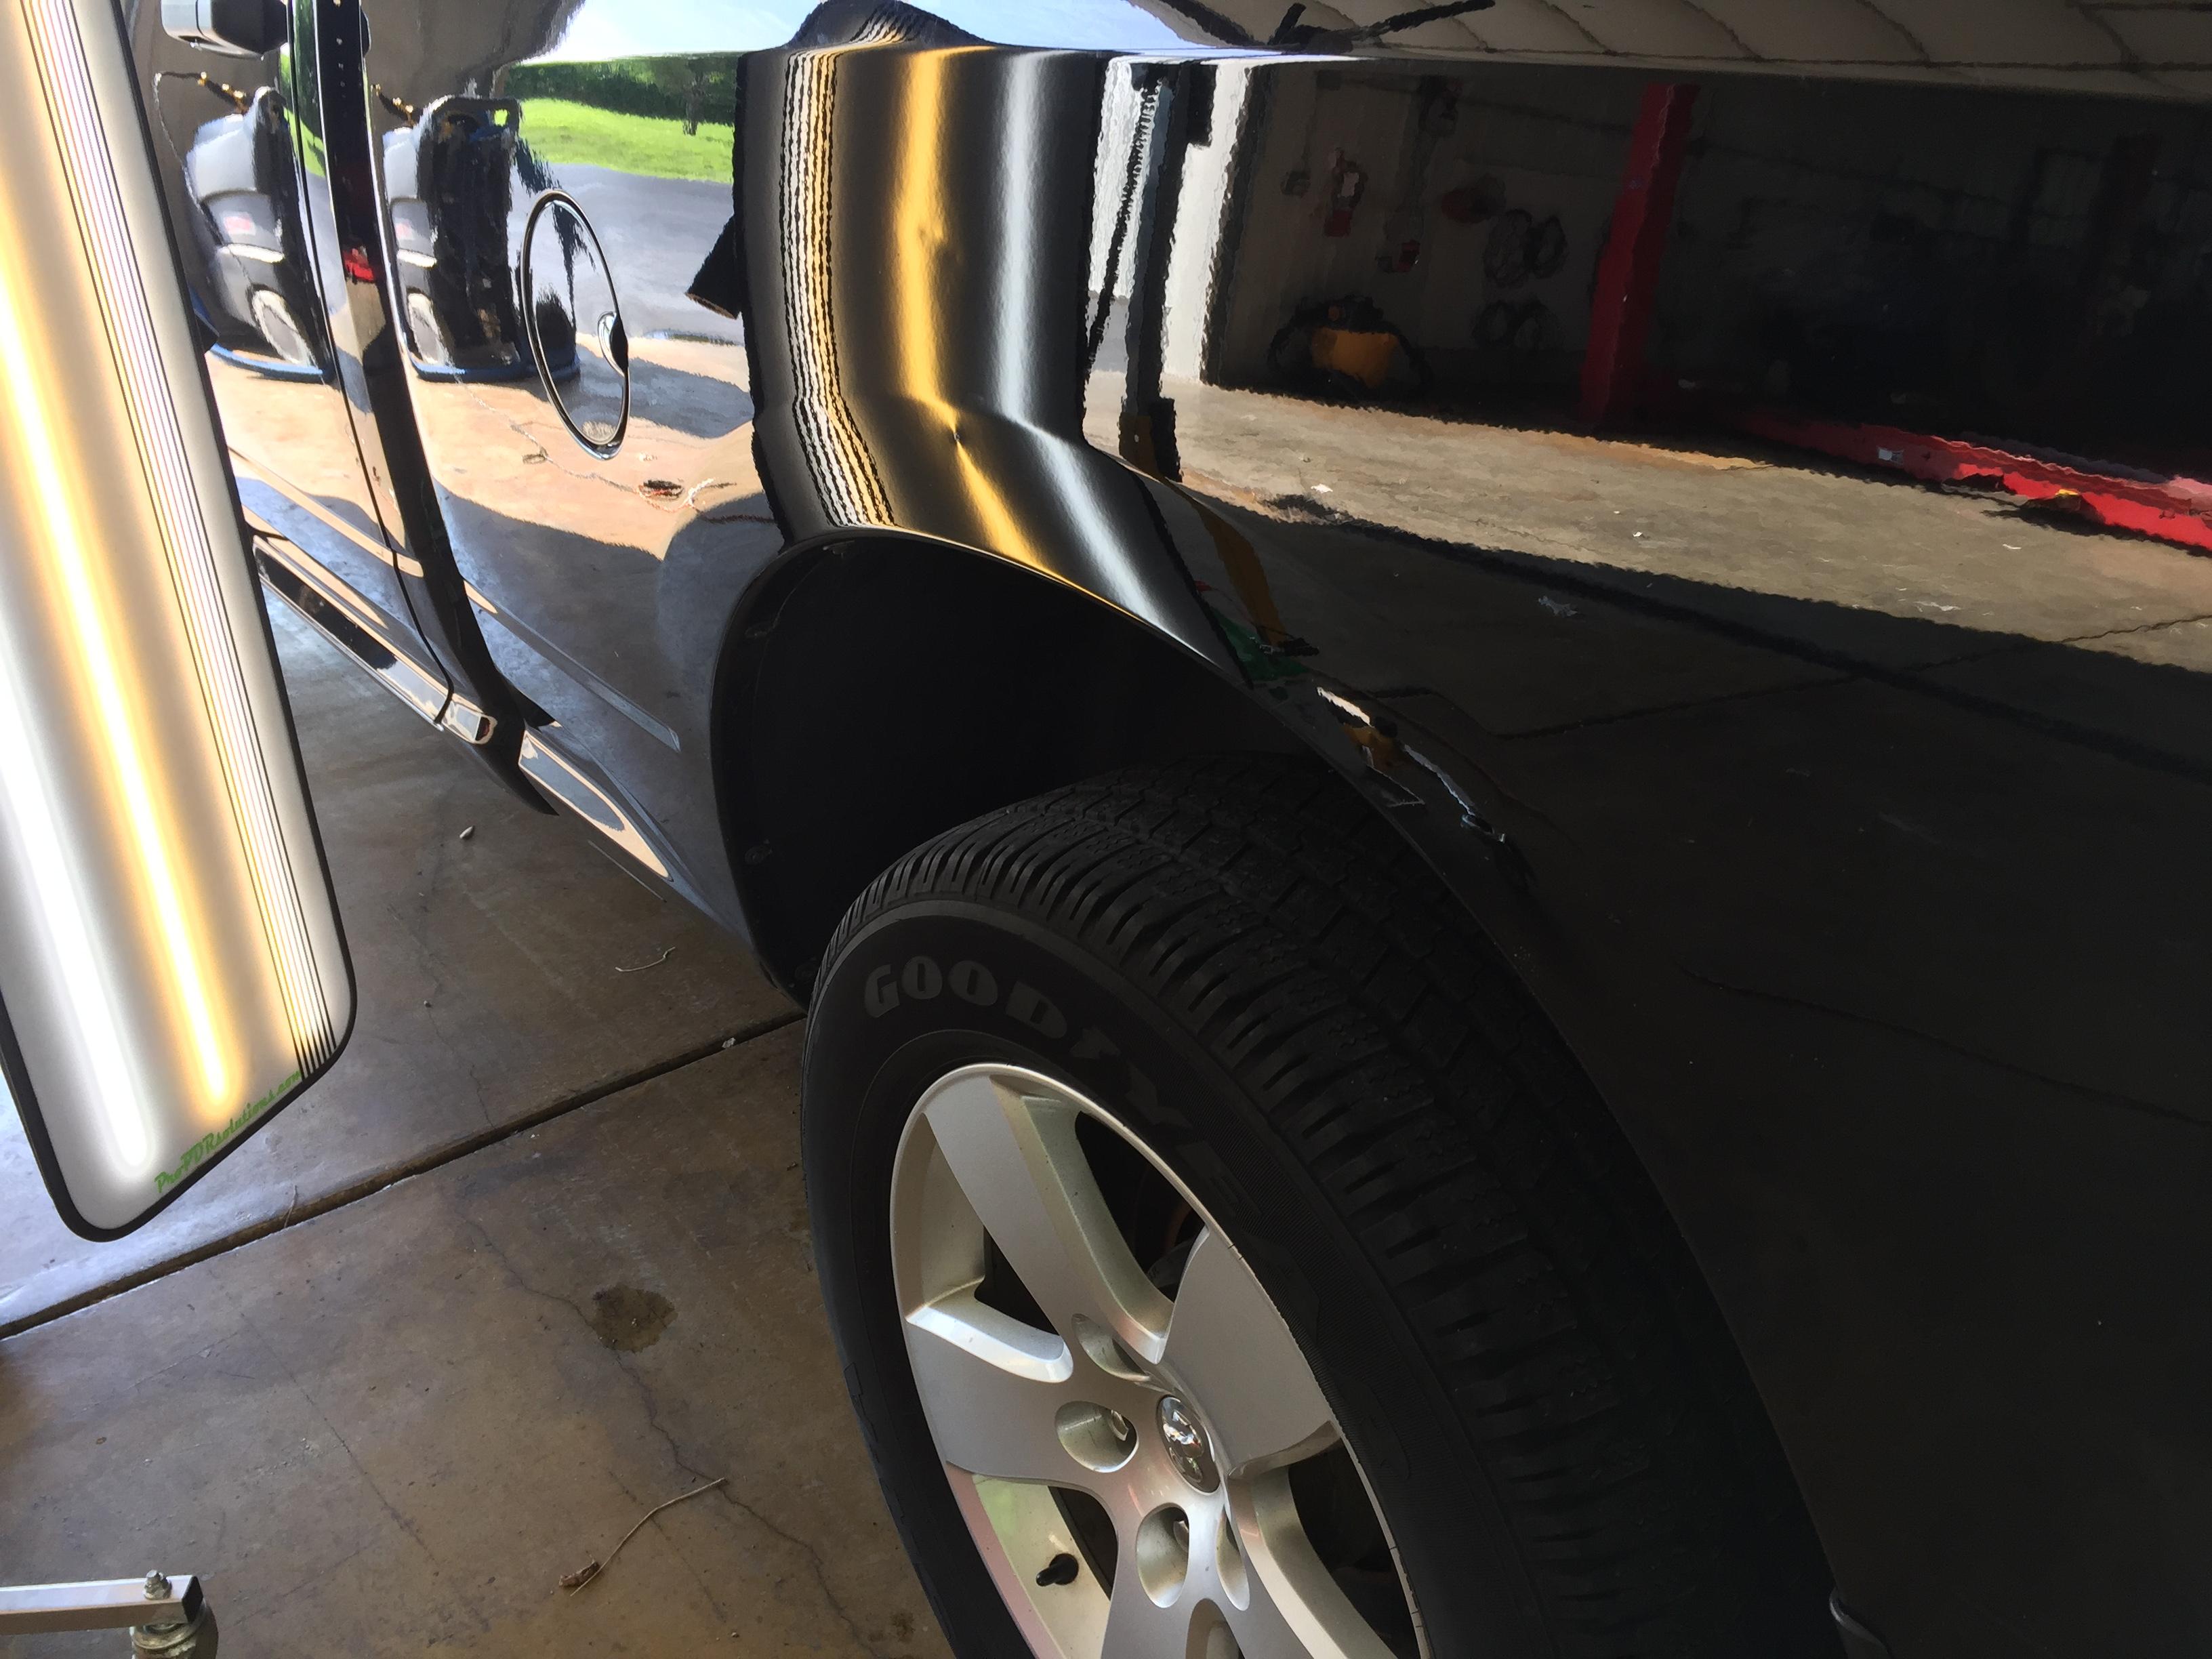 2012 Dodge Ram Bedside Damage, Paintless Dent Repair, Springfield, IL. http://217dent.com